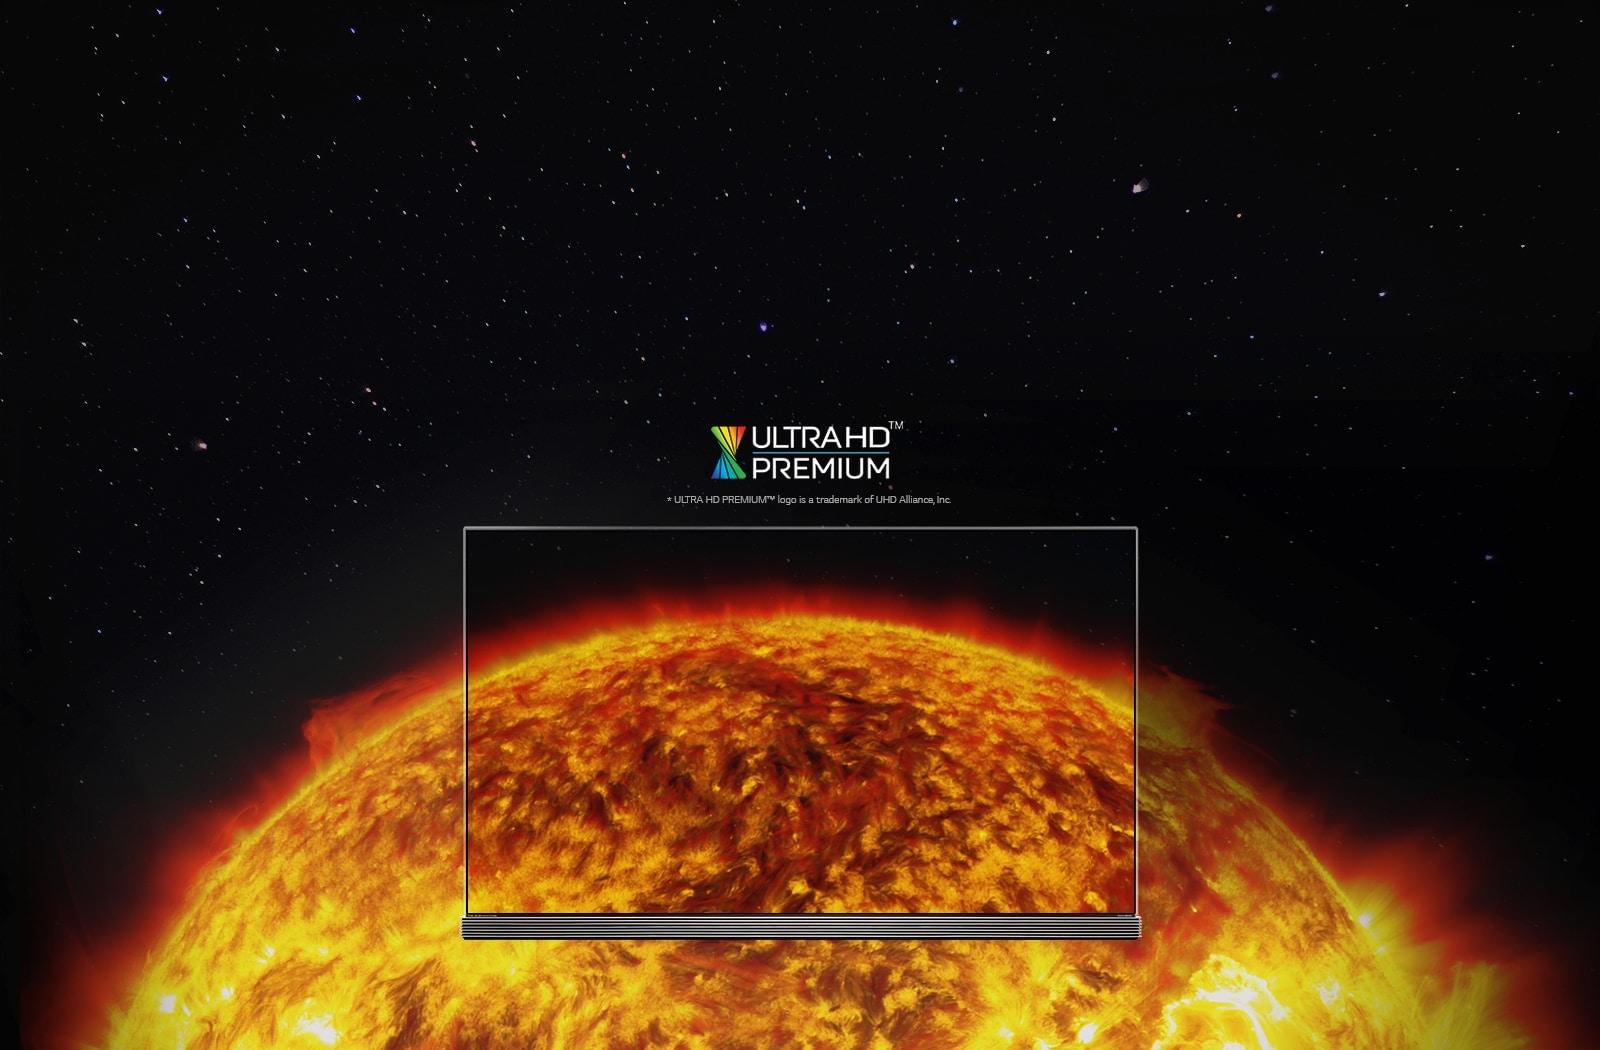 ULTRA HD PREMIUM A New Standard Of Defining TV